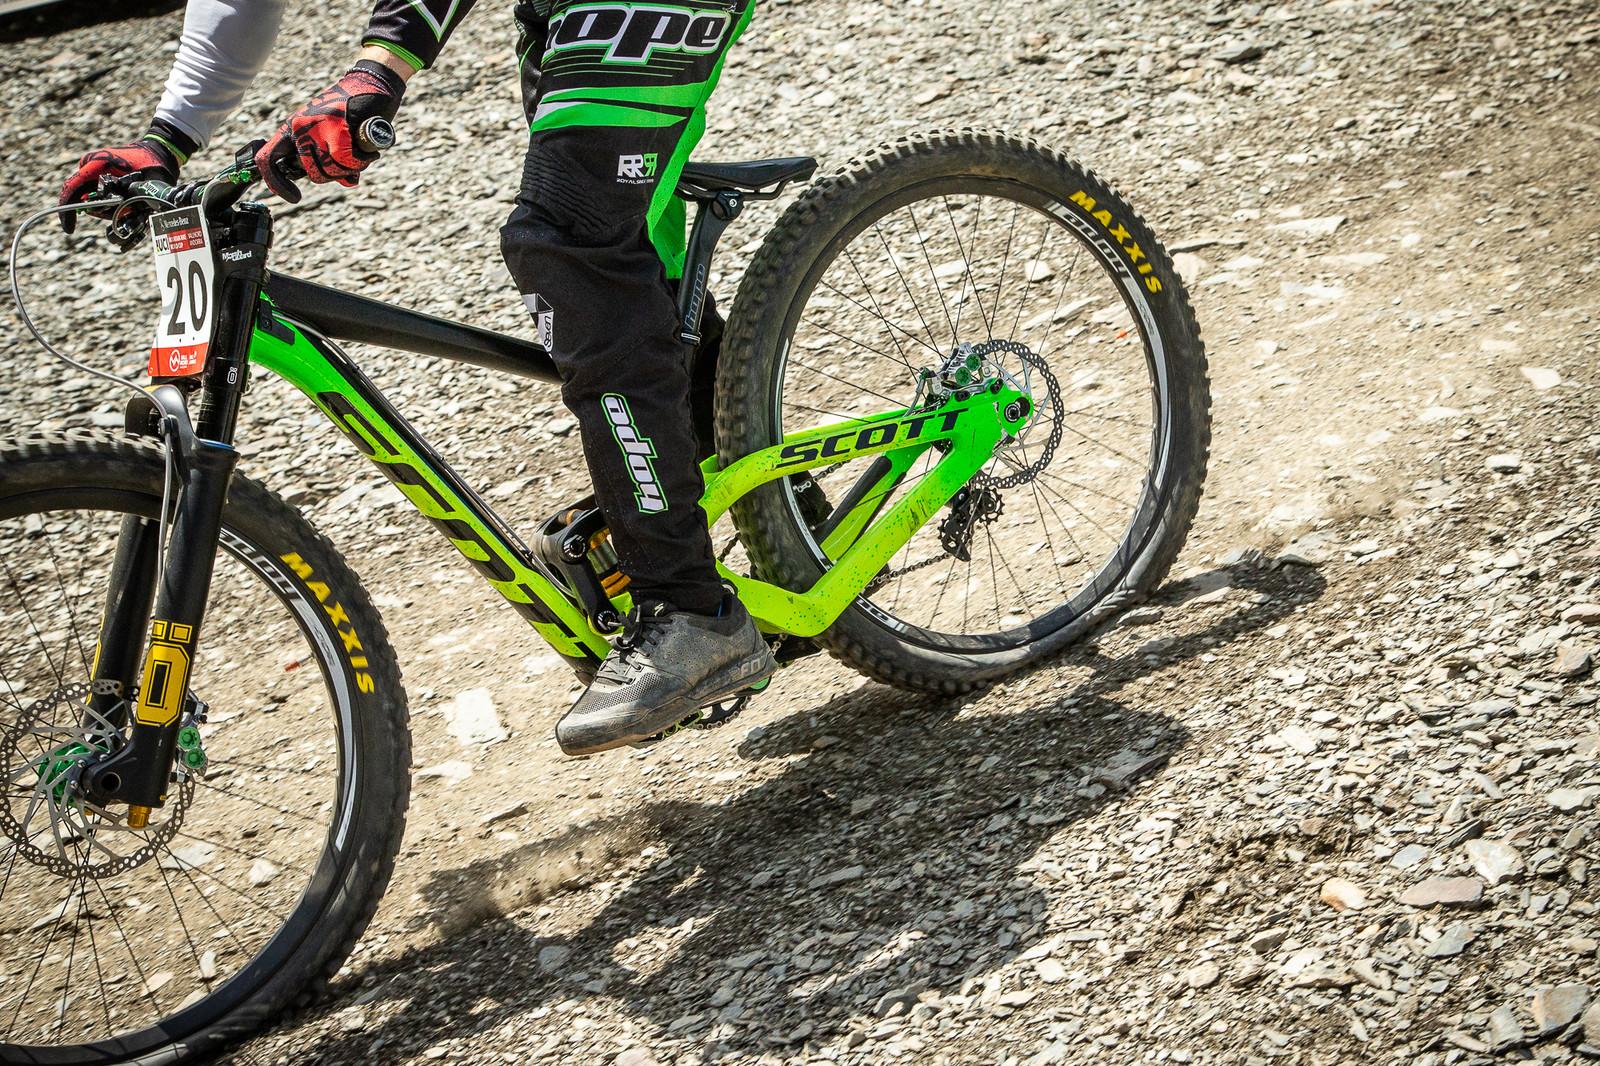 Adam Brayton Scott Gambler.  - G-Out Project - Andorra World Cup DH - Mountain Biking Pictures - Vital MTB